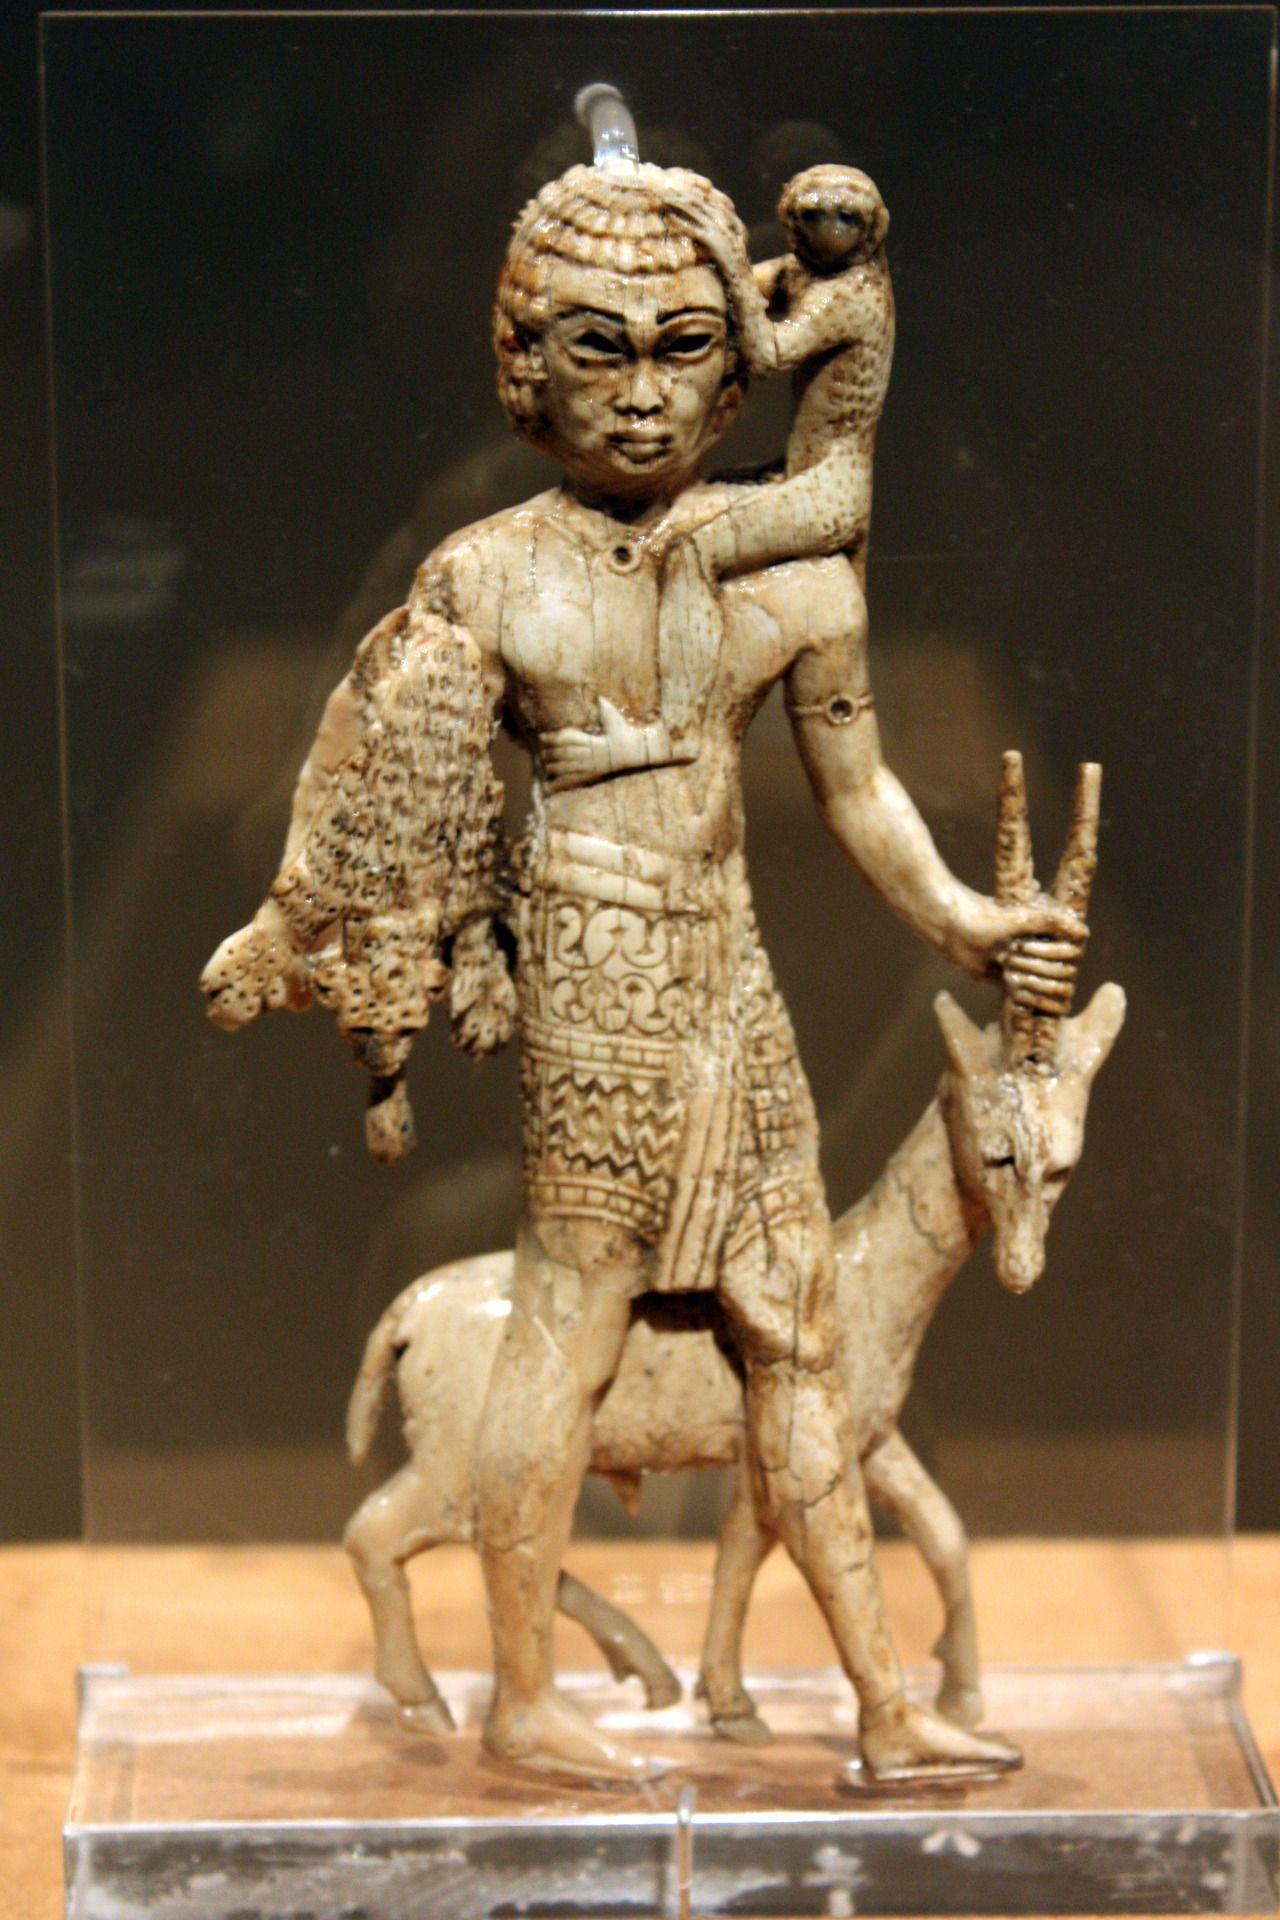 ancientart: Nubian tribute bearer with an oryx, a monkey ...